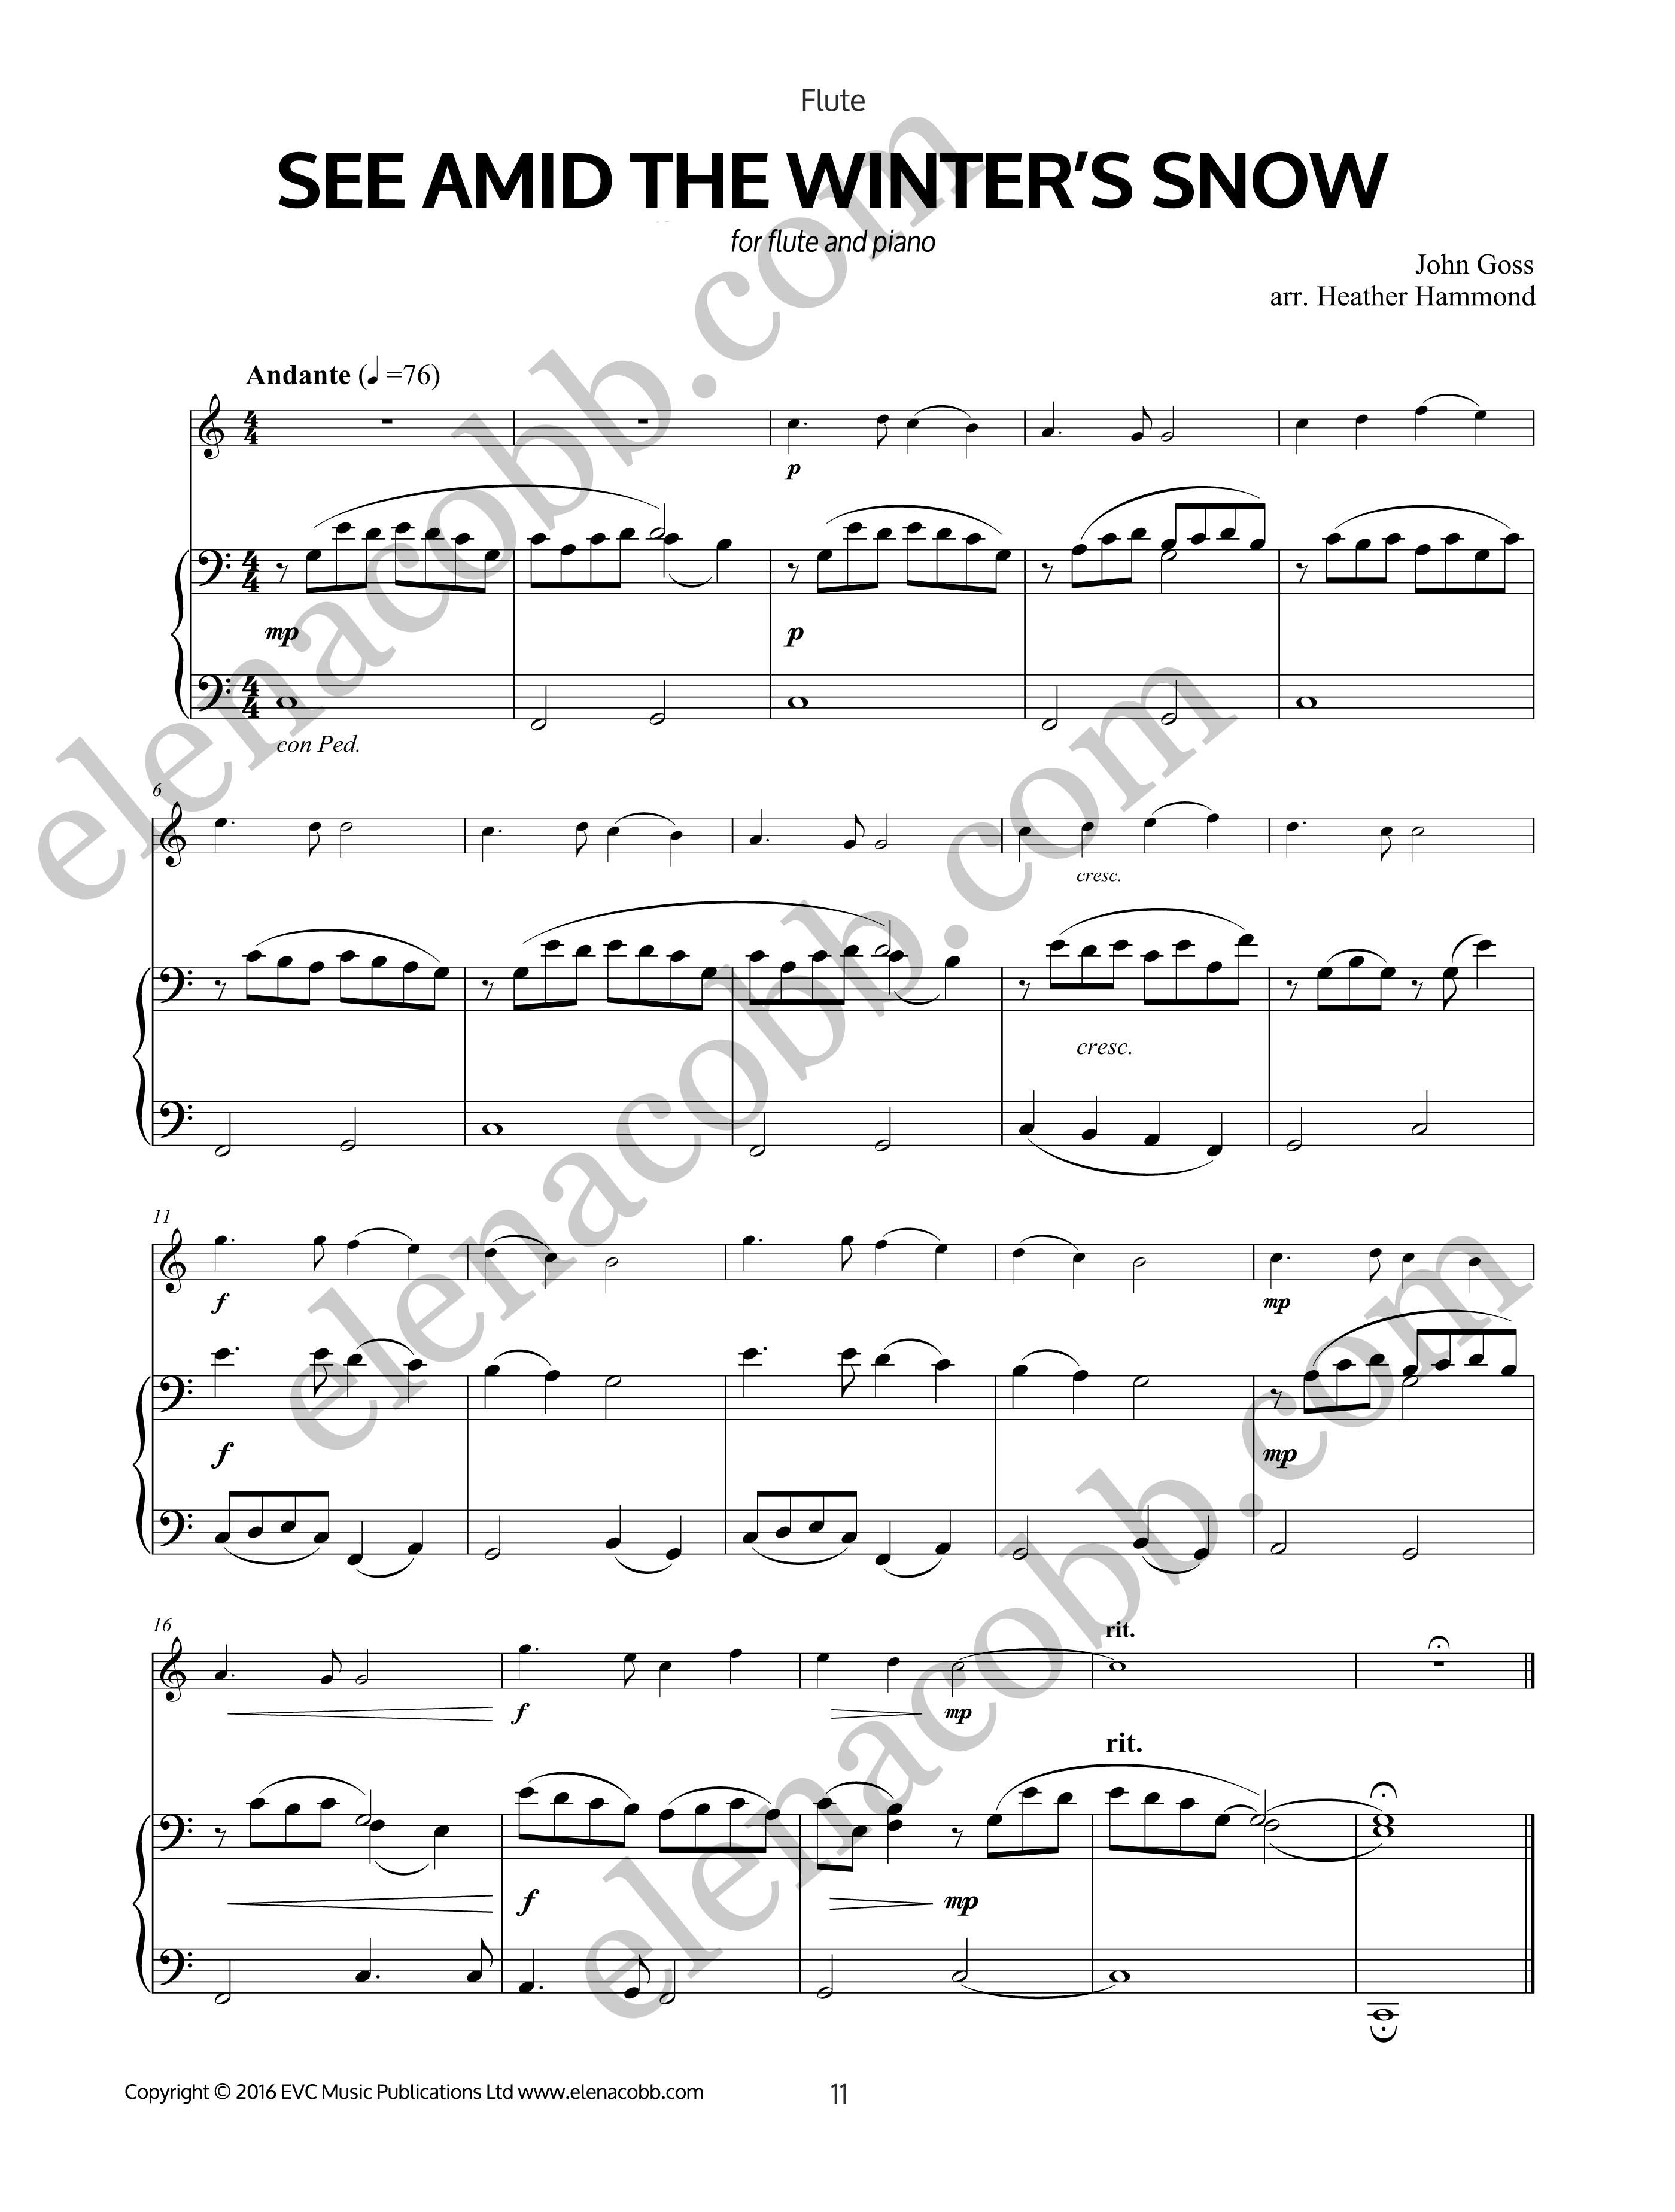 Four Christmas Carols Arr H Hammond Easy Flute